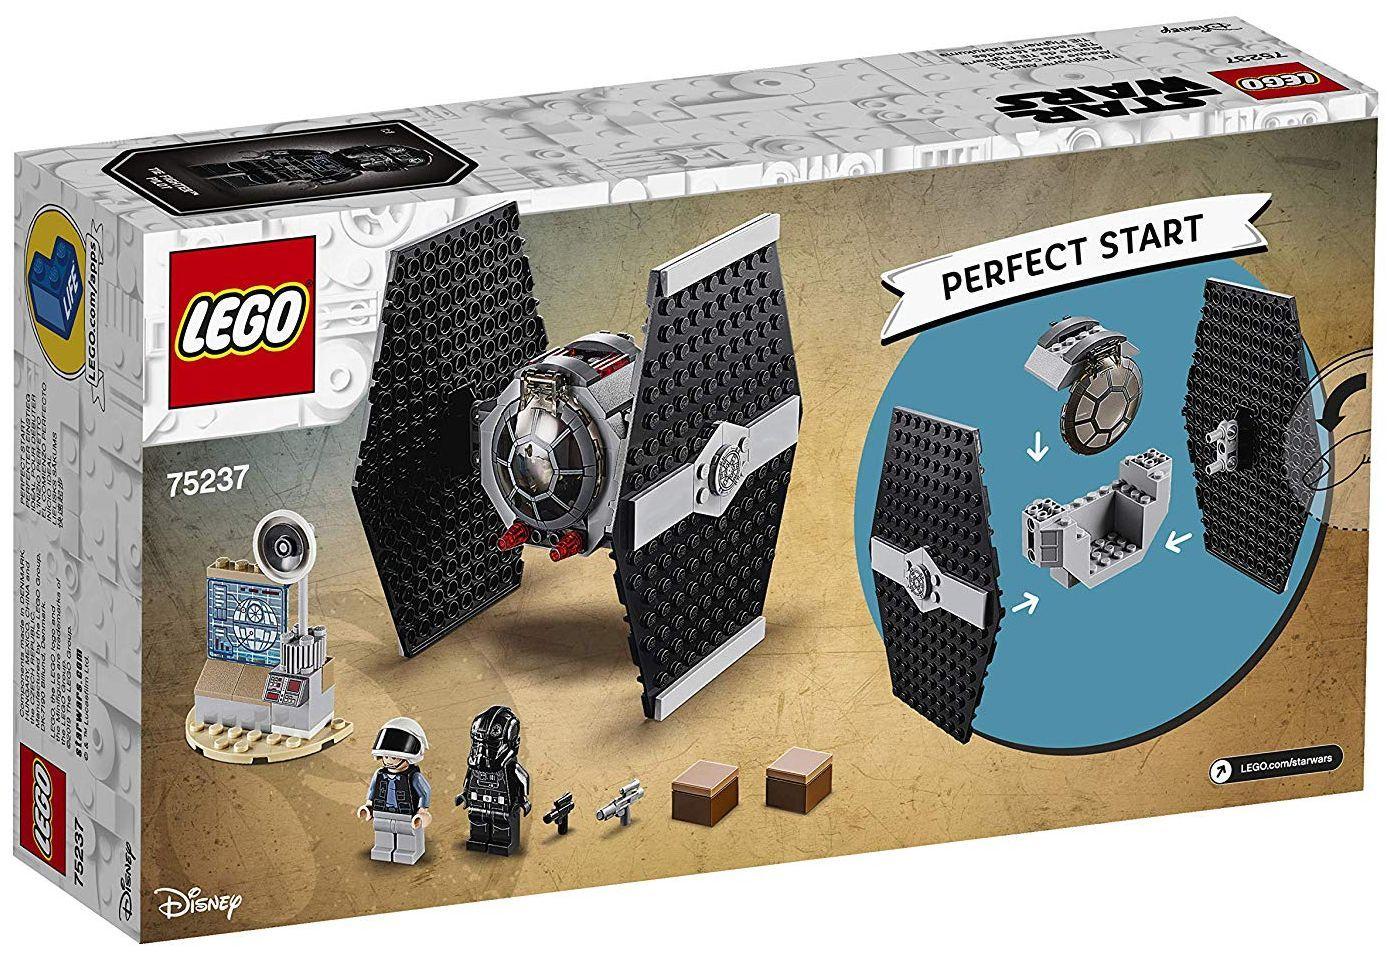 Конструктор Lego Star Wars - TIE Fighter Attack (75237) - 6